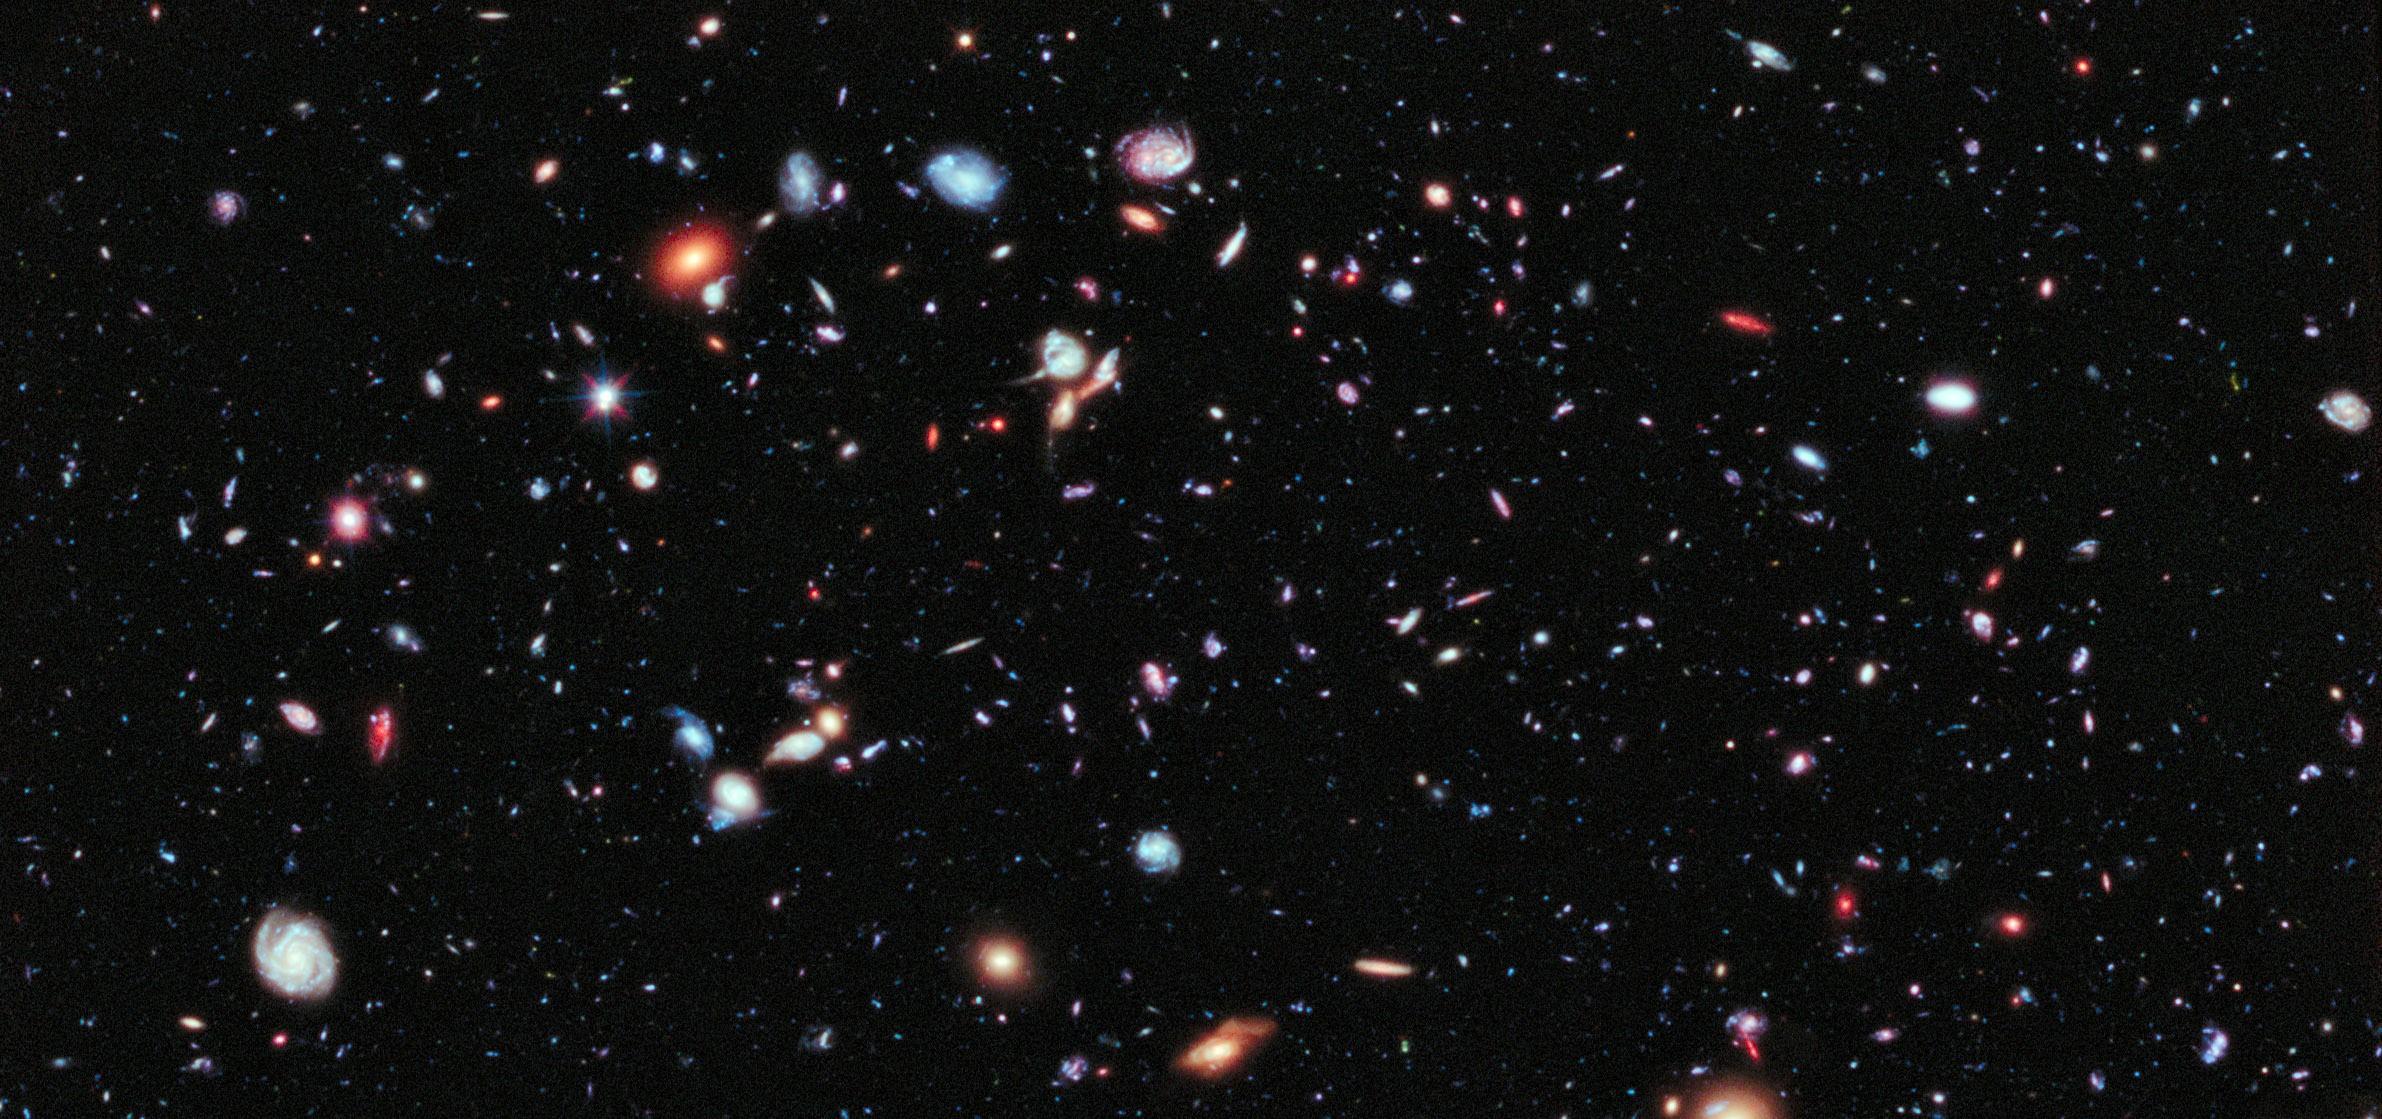 Coisas interessantes sobre o Cosmos — Parte 1 | by Fernando Bombardelli | Medium